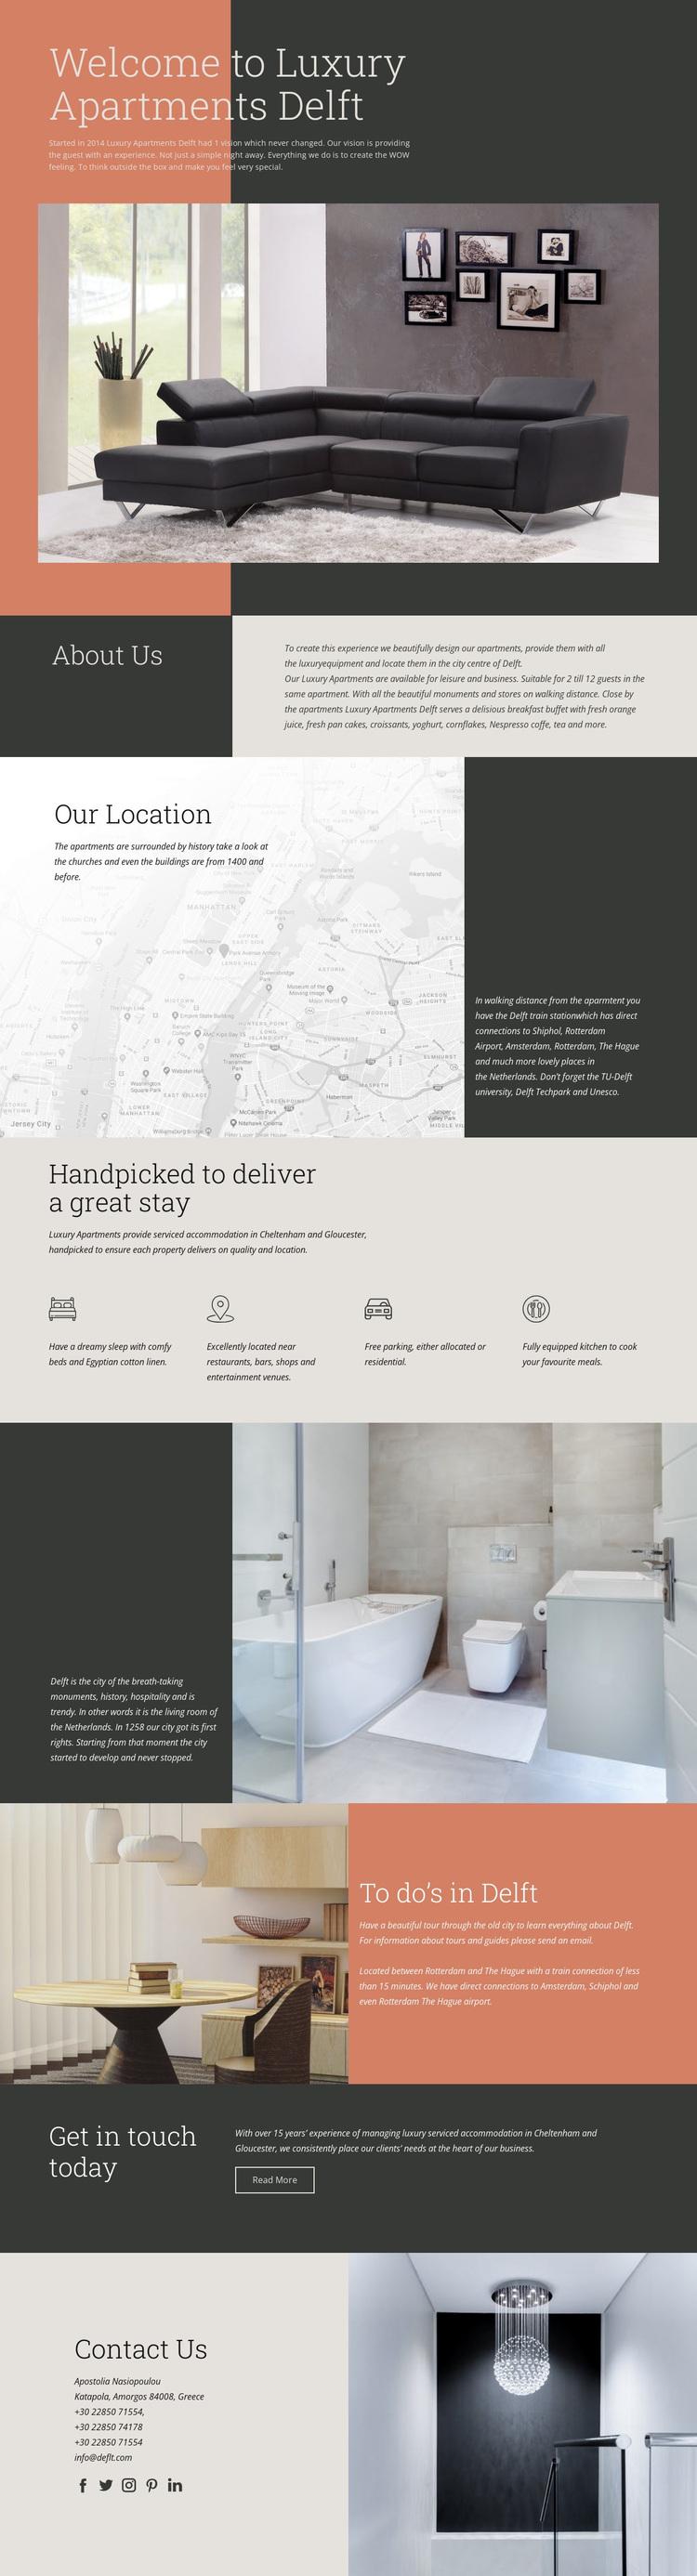 Luxury Apartments Joomla Page Builder